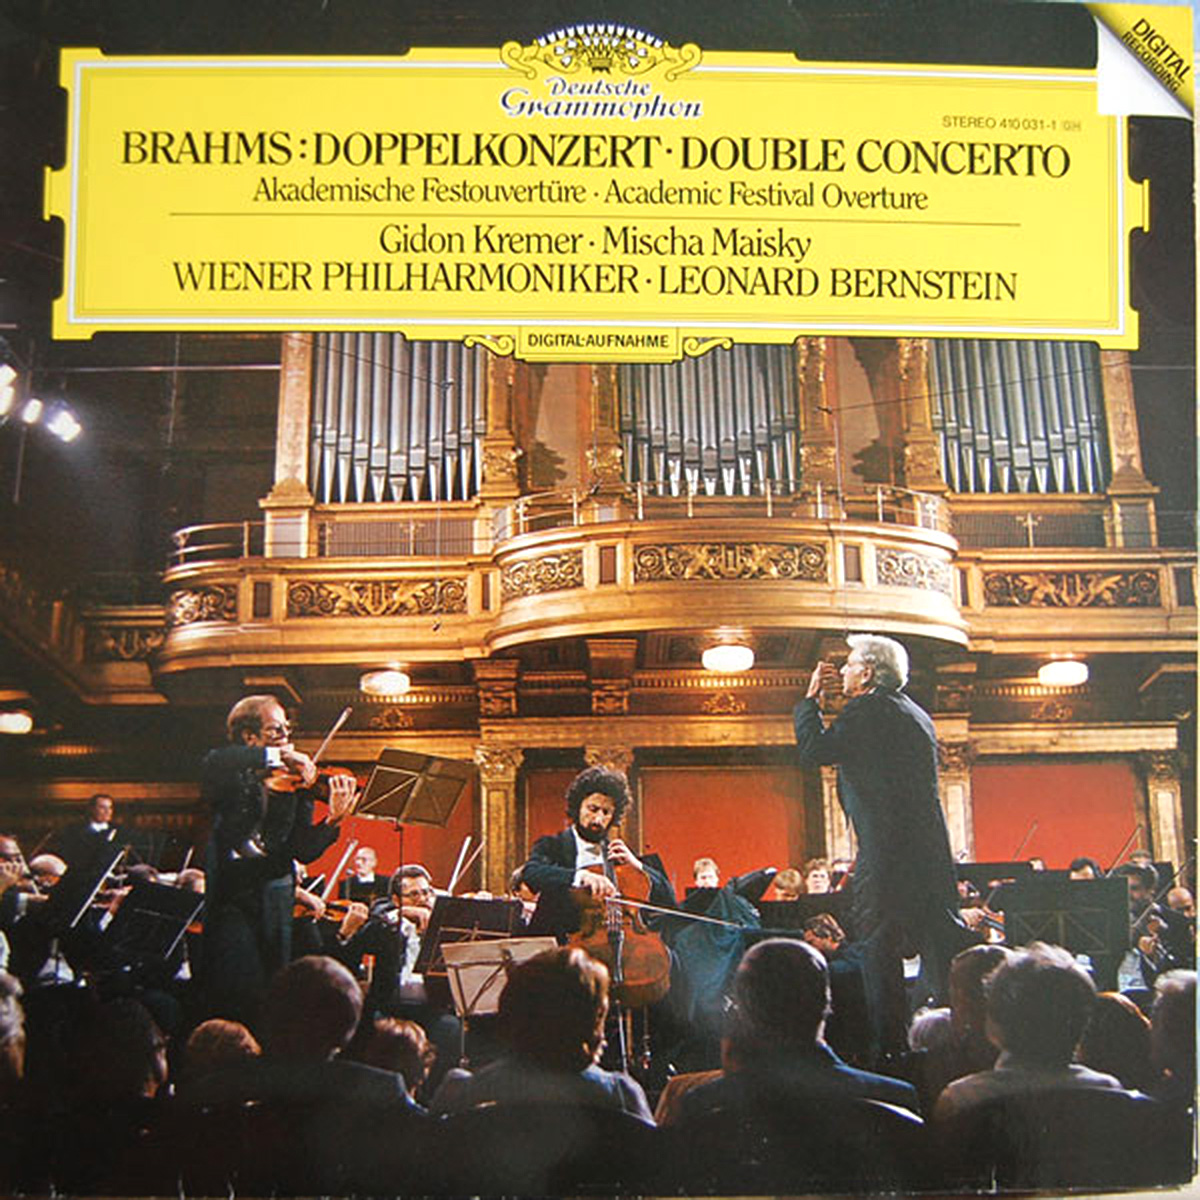 DGG 410 031 Brahms Doppelkonzert Kremer Maisky Bernstein DGG Digital Aufnahme